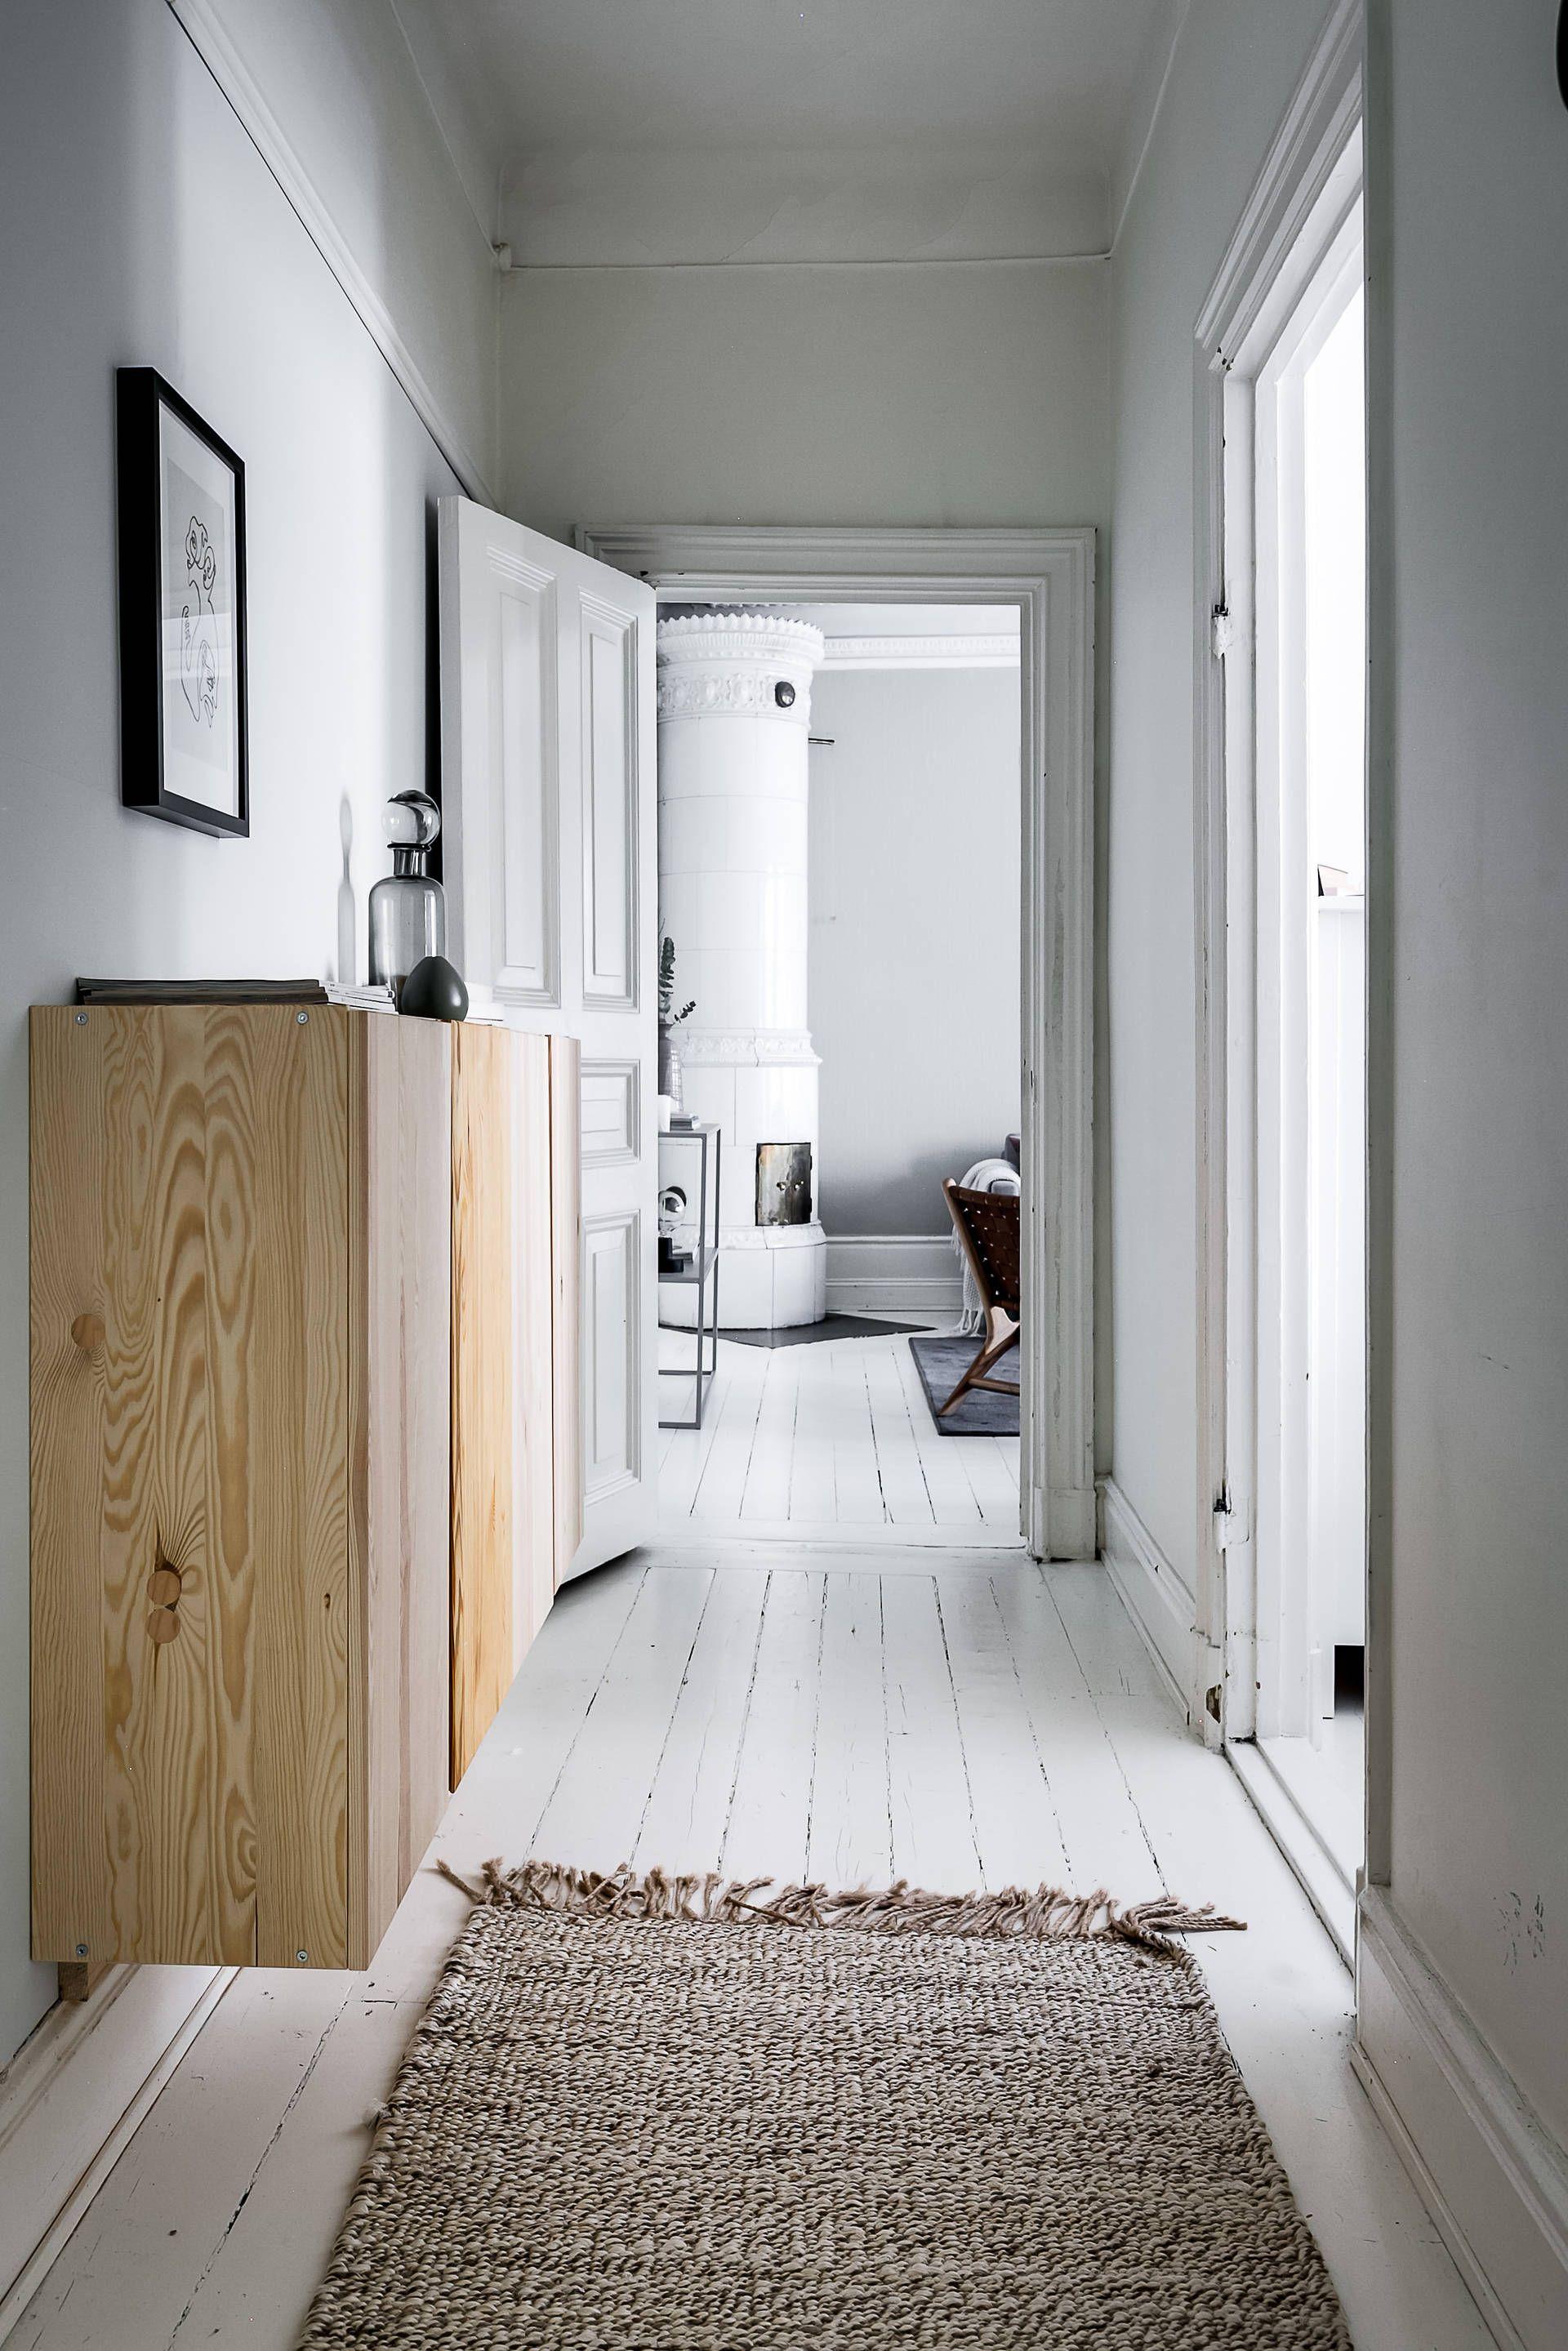 Ikea Ivar Cabinet Home In 2019 Pinterest Arrumacao